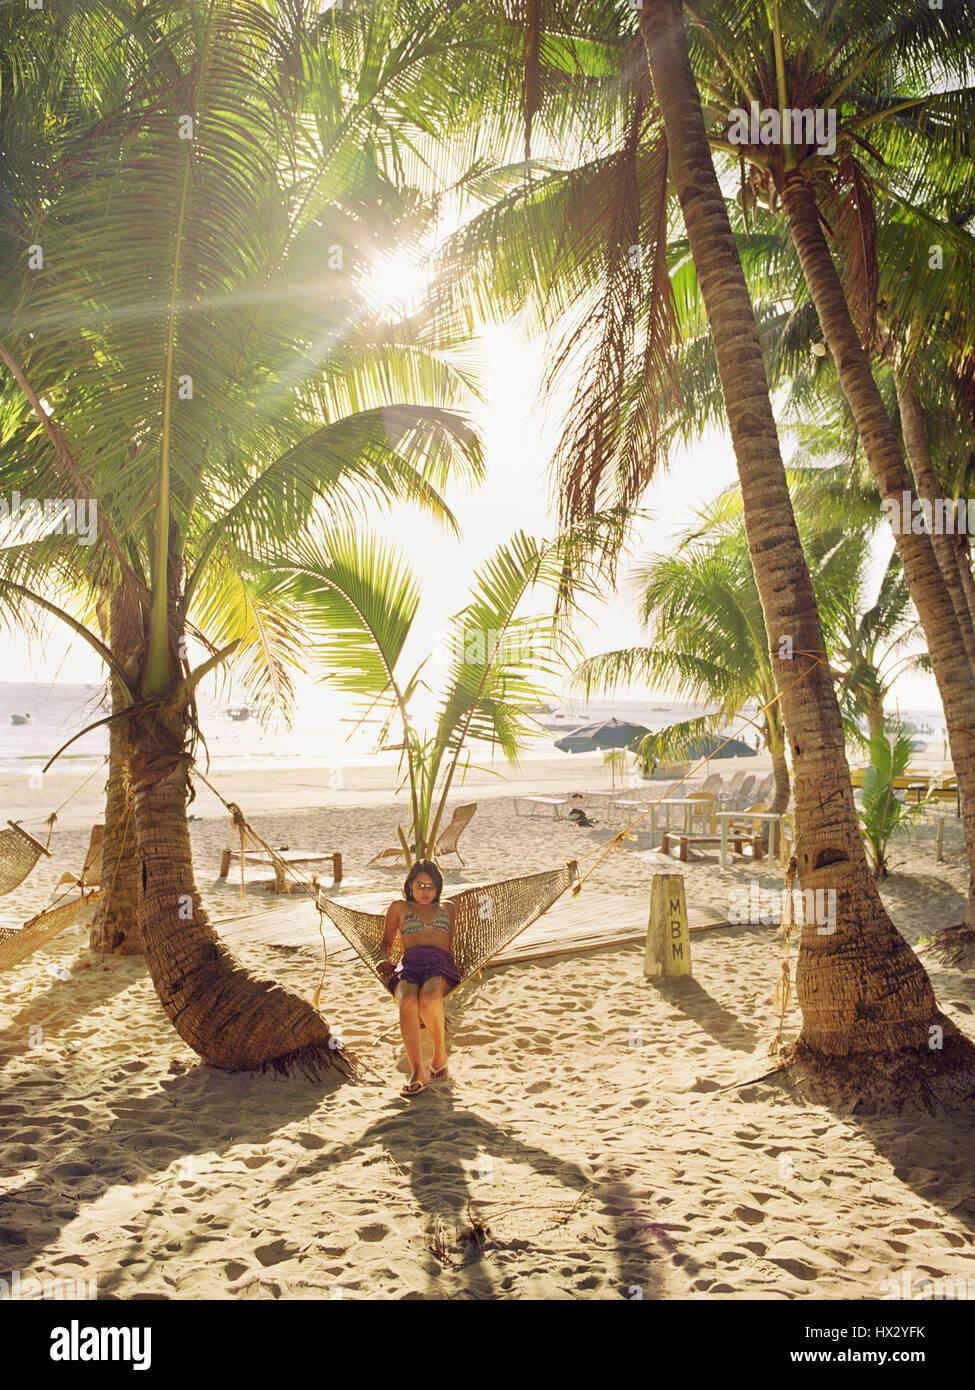 Donna relax in amaca in spiaggia Immagini Stock